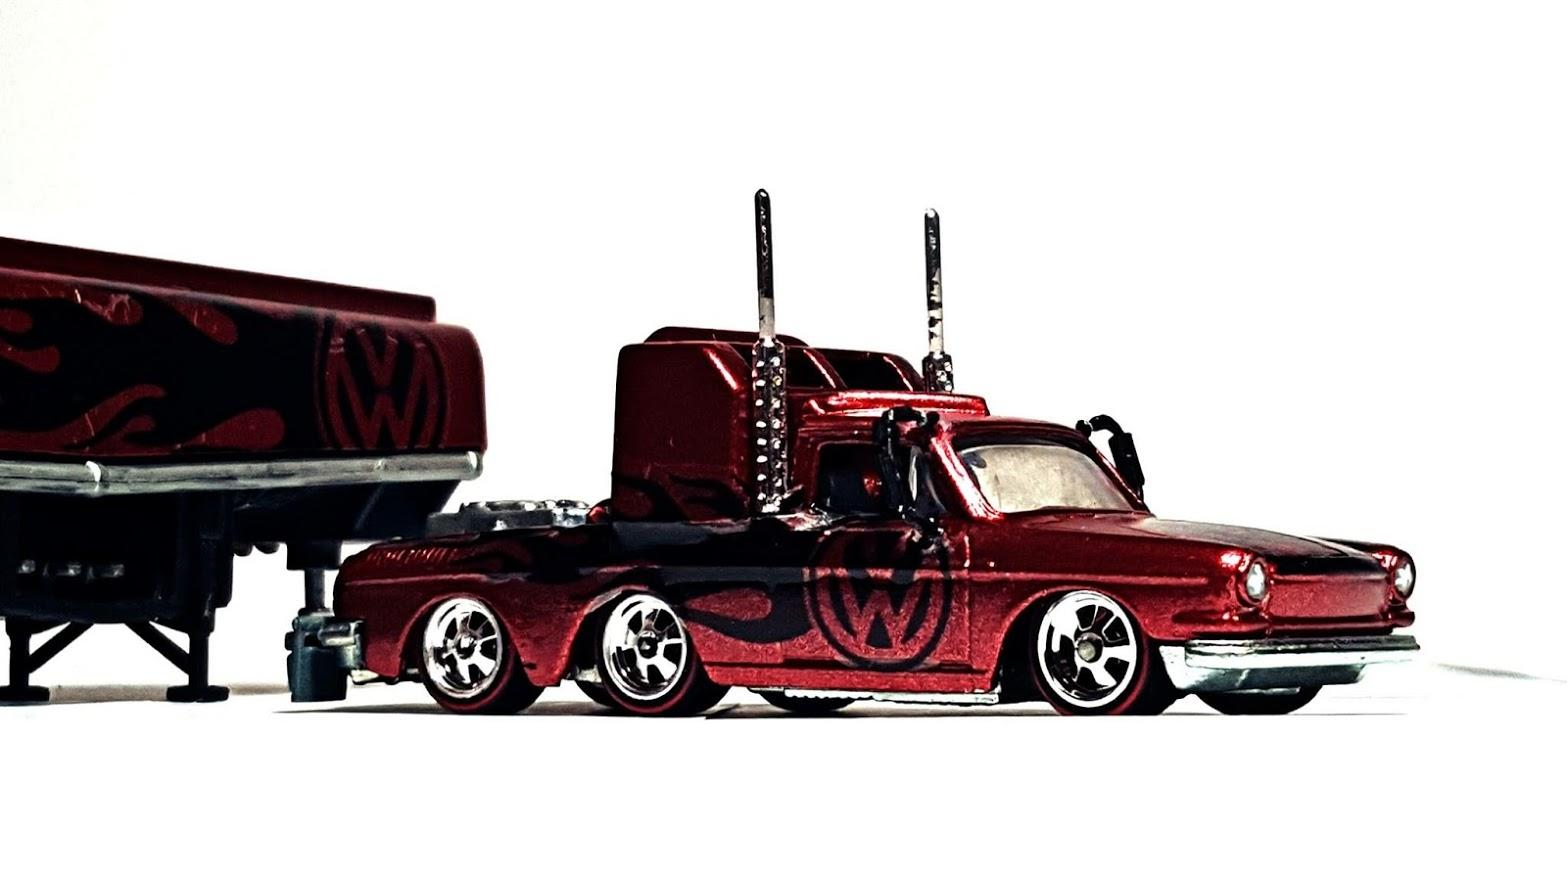 volkswagen-squareback-tanker-7 - Custom Hot Wheels & Diecast